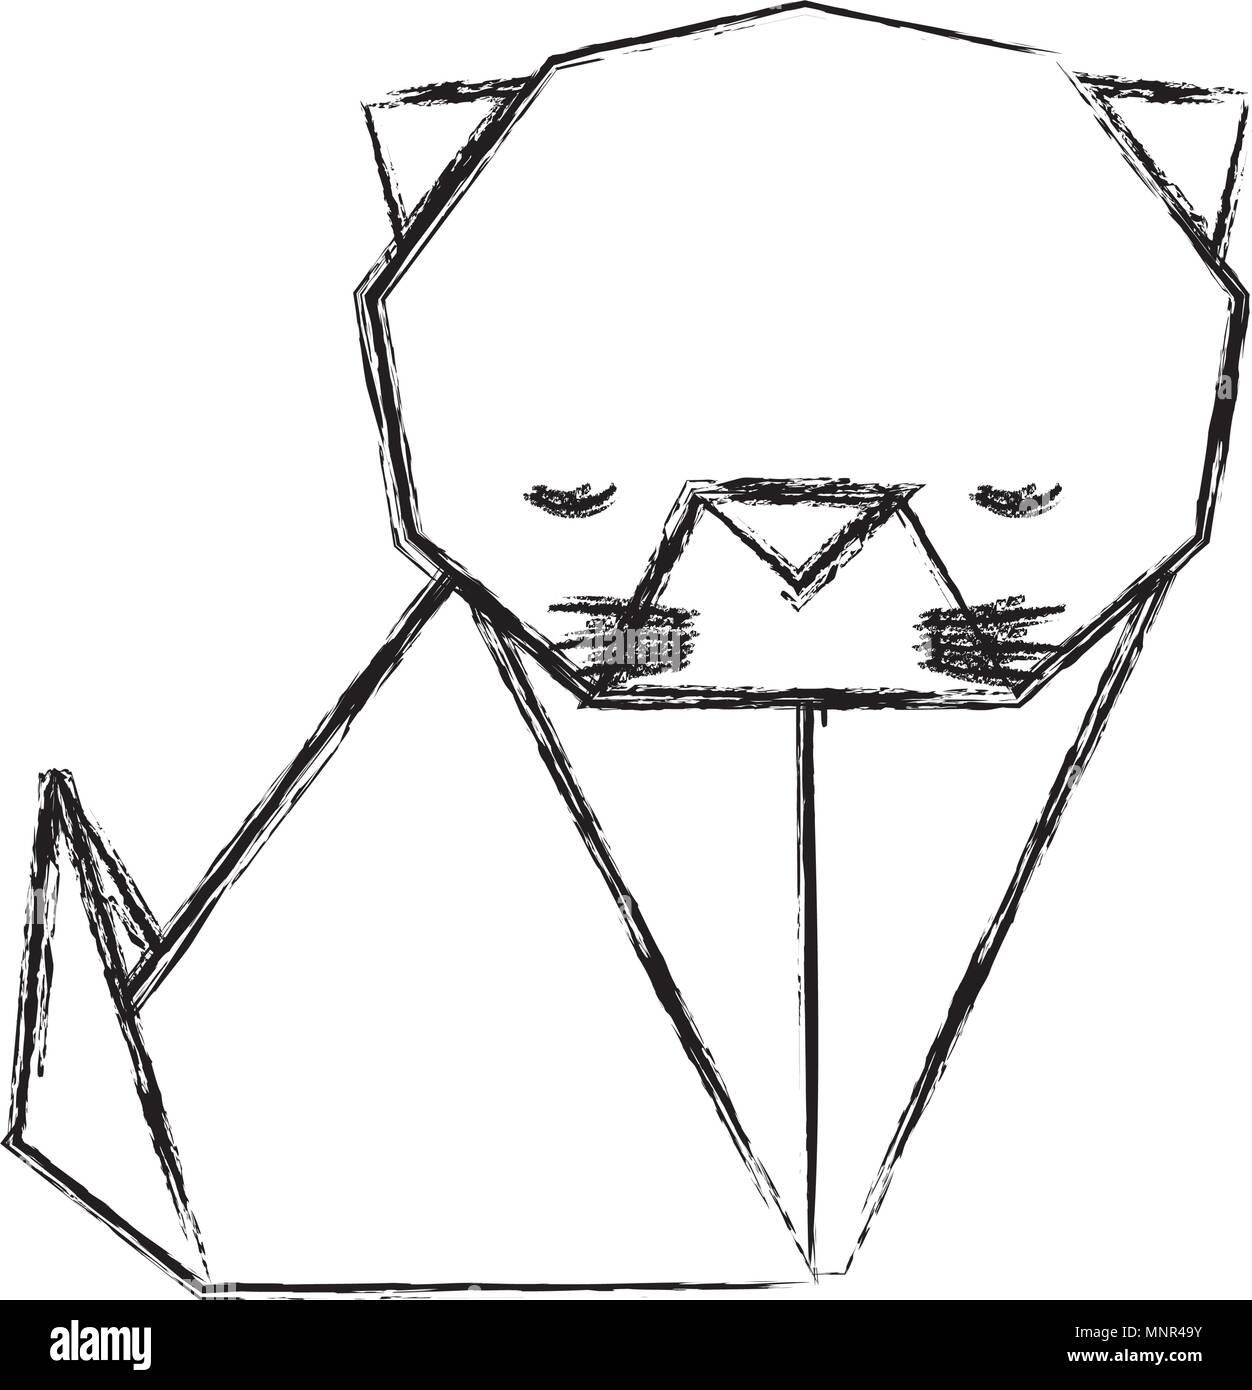 Cat Origami Papier Symbol Vektor Abbildung Bild 185519767 Alamy Diagram